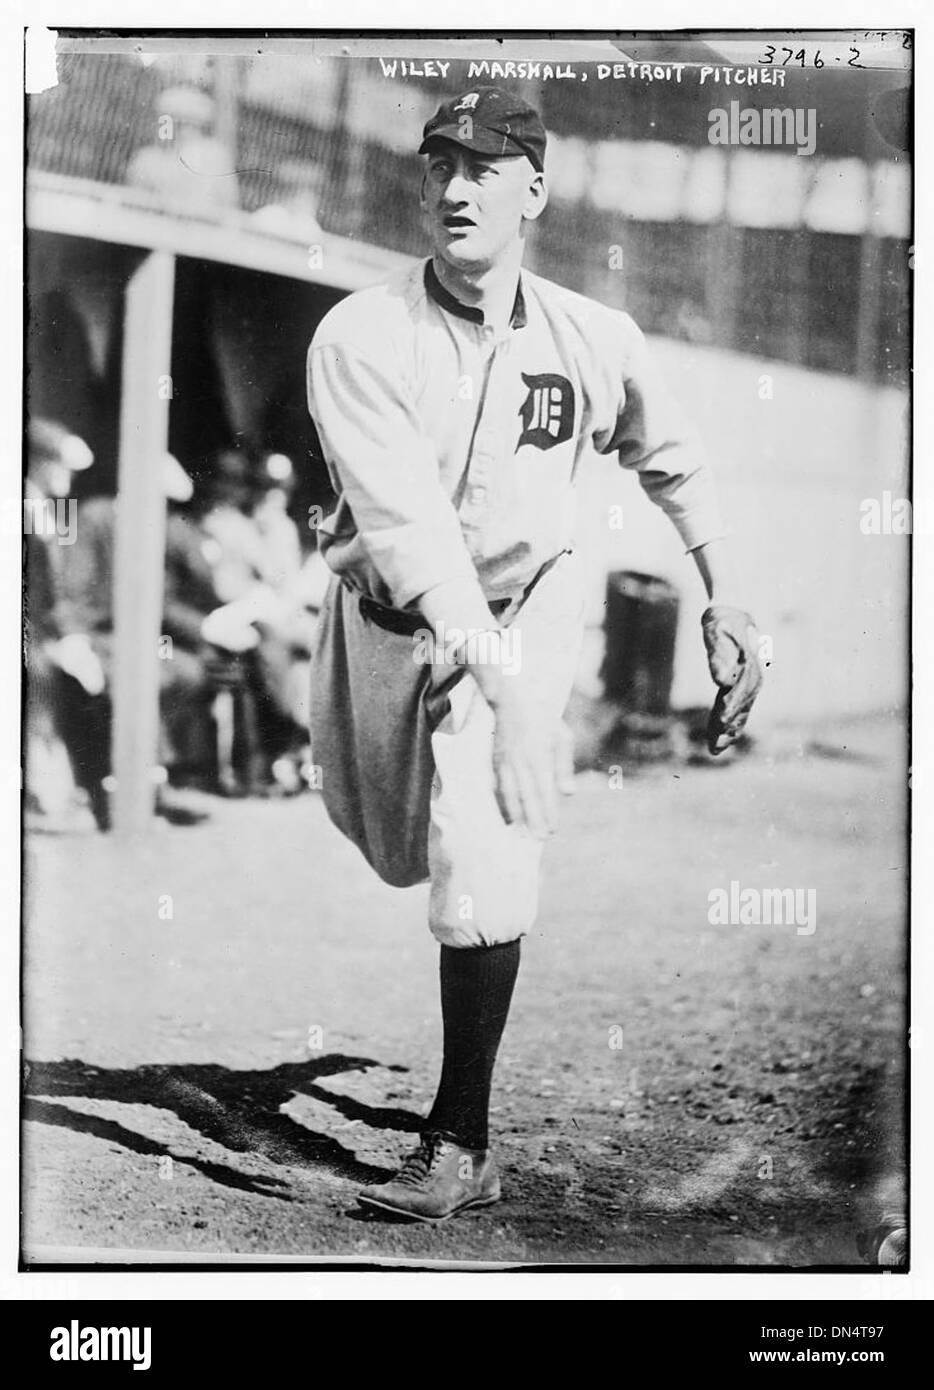 [Wiley Marshall, spring prospect pitcher, Detroit AL (baseball)] (LOC) - Stock Image